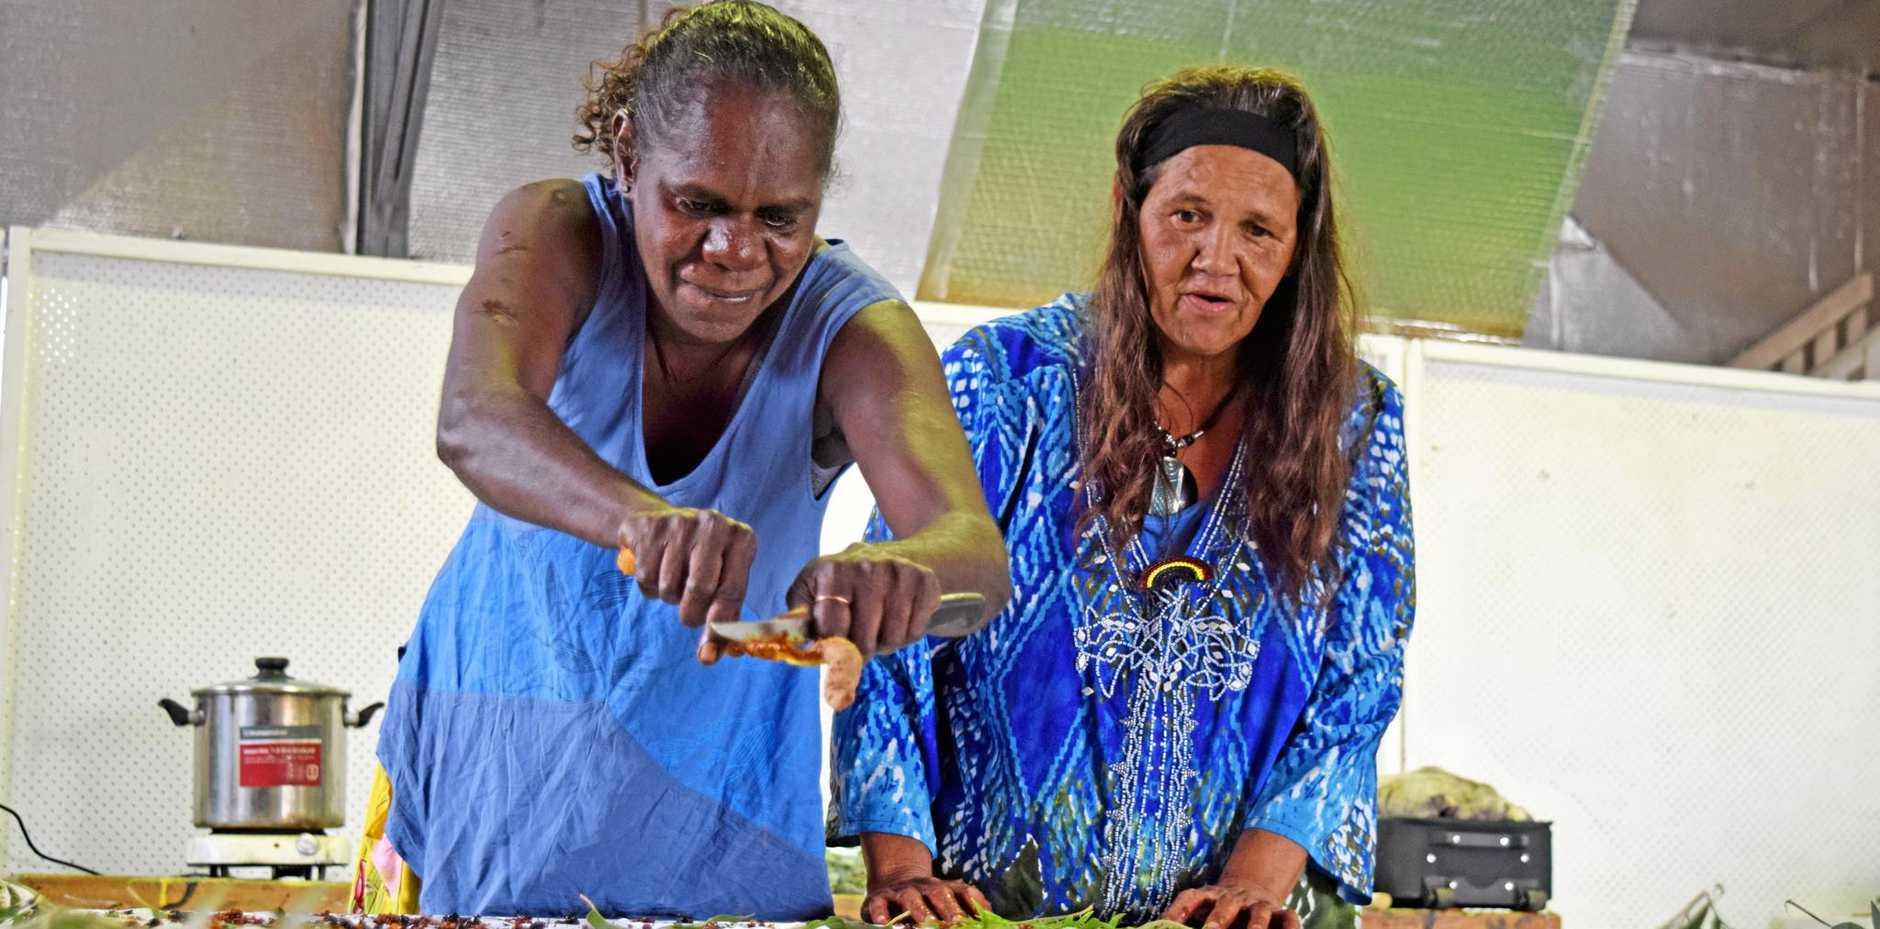 COLLABORATION: Kunwinjku and Bundjalung women work side by side using plants to dye silk at Jambama Arts Centre in Casino.